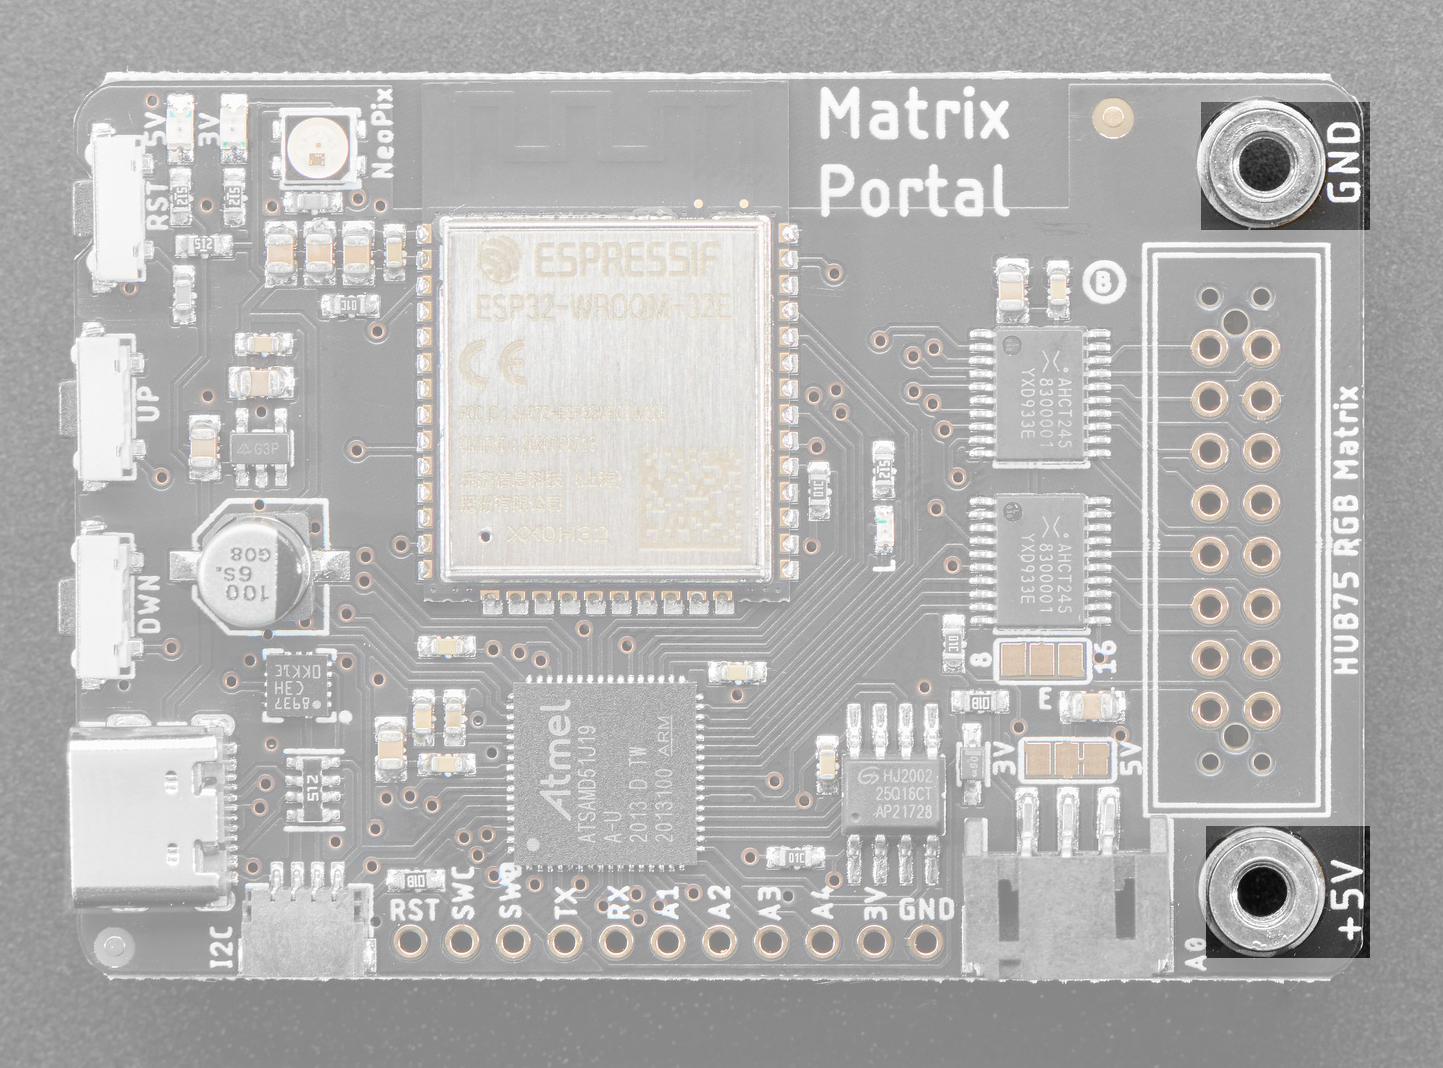 led_matrices_matrixportal_pinout_power.jpg